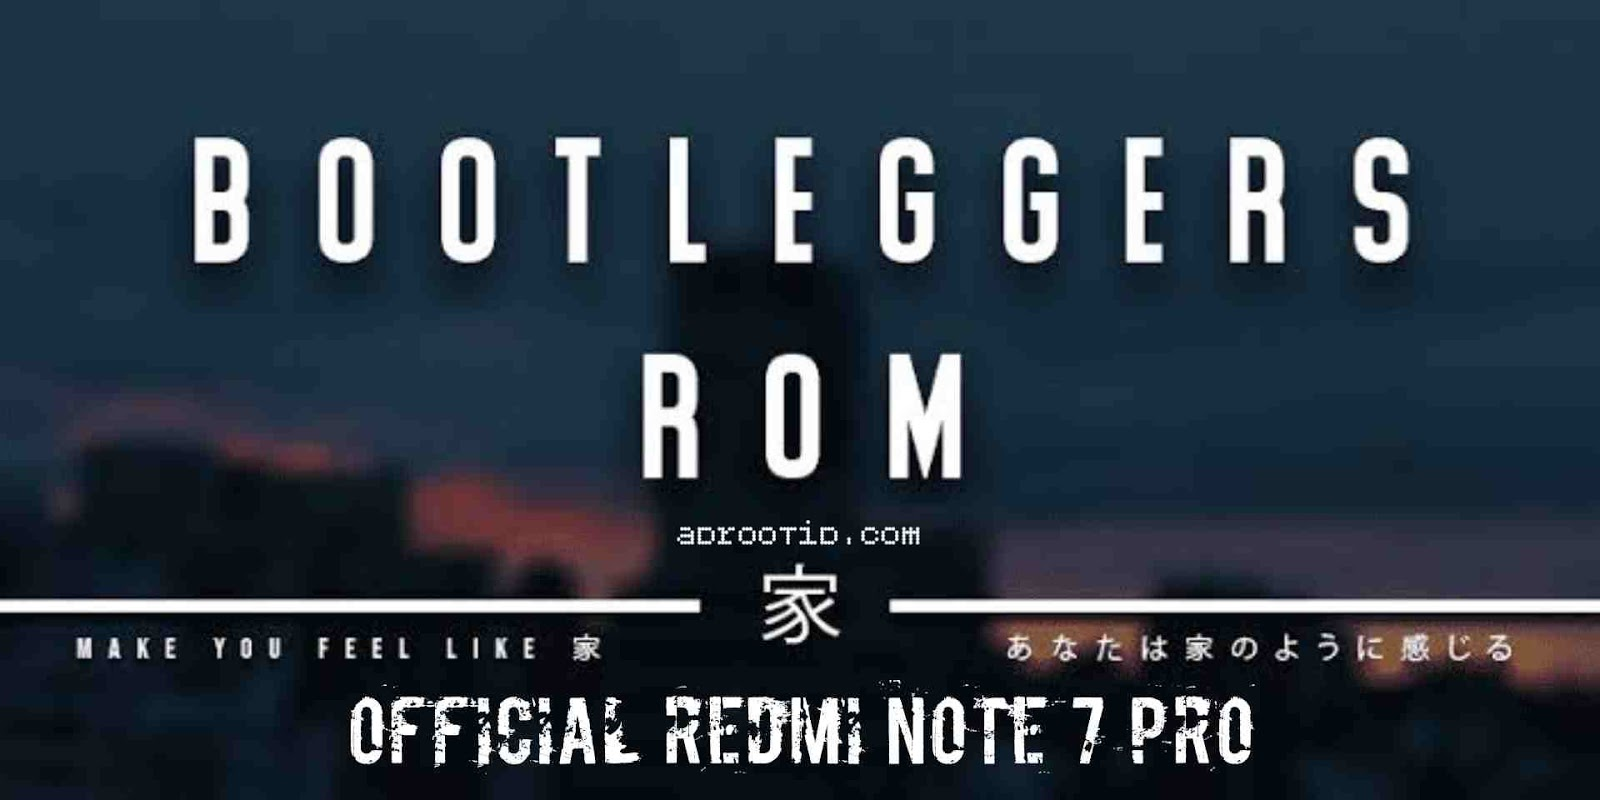 Rom bootleggers redmi note 7 pro